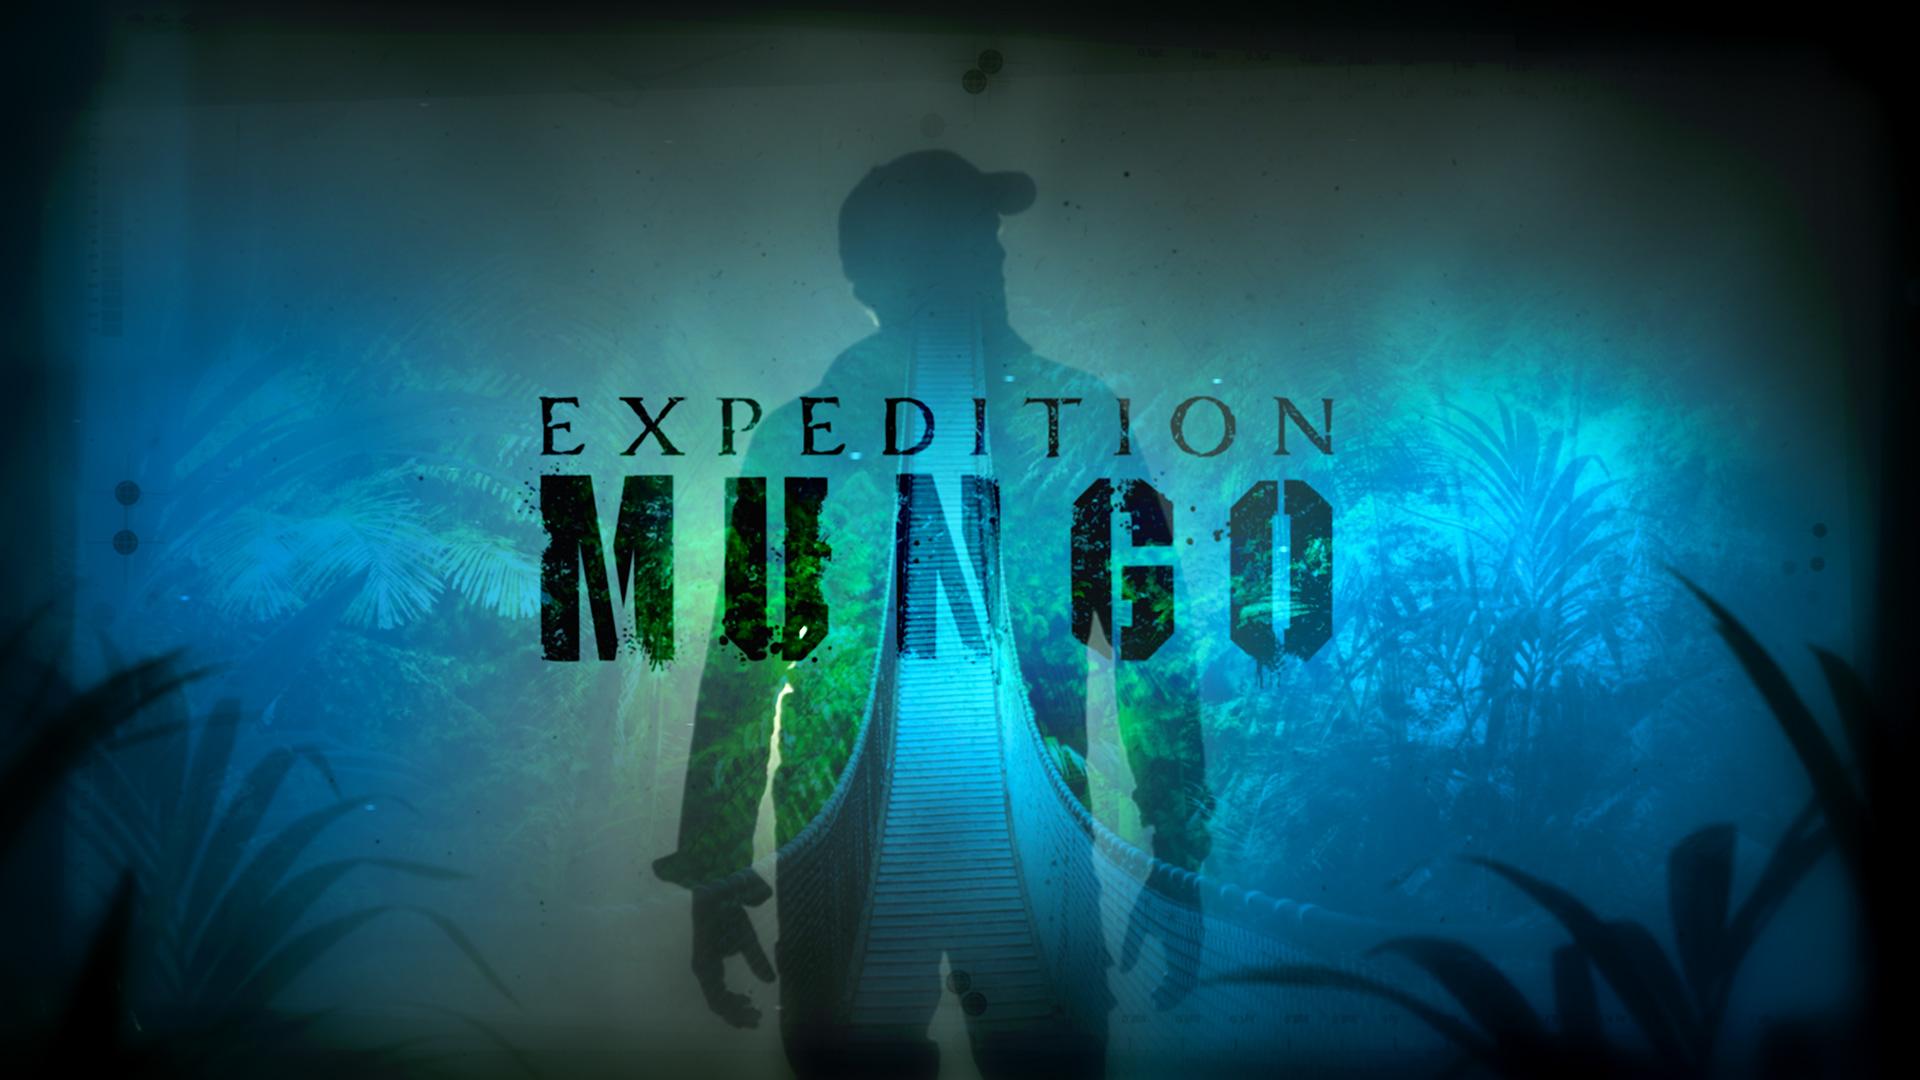 Expedition Mungo, © Holey & Moley Ltd, Title Branding